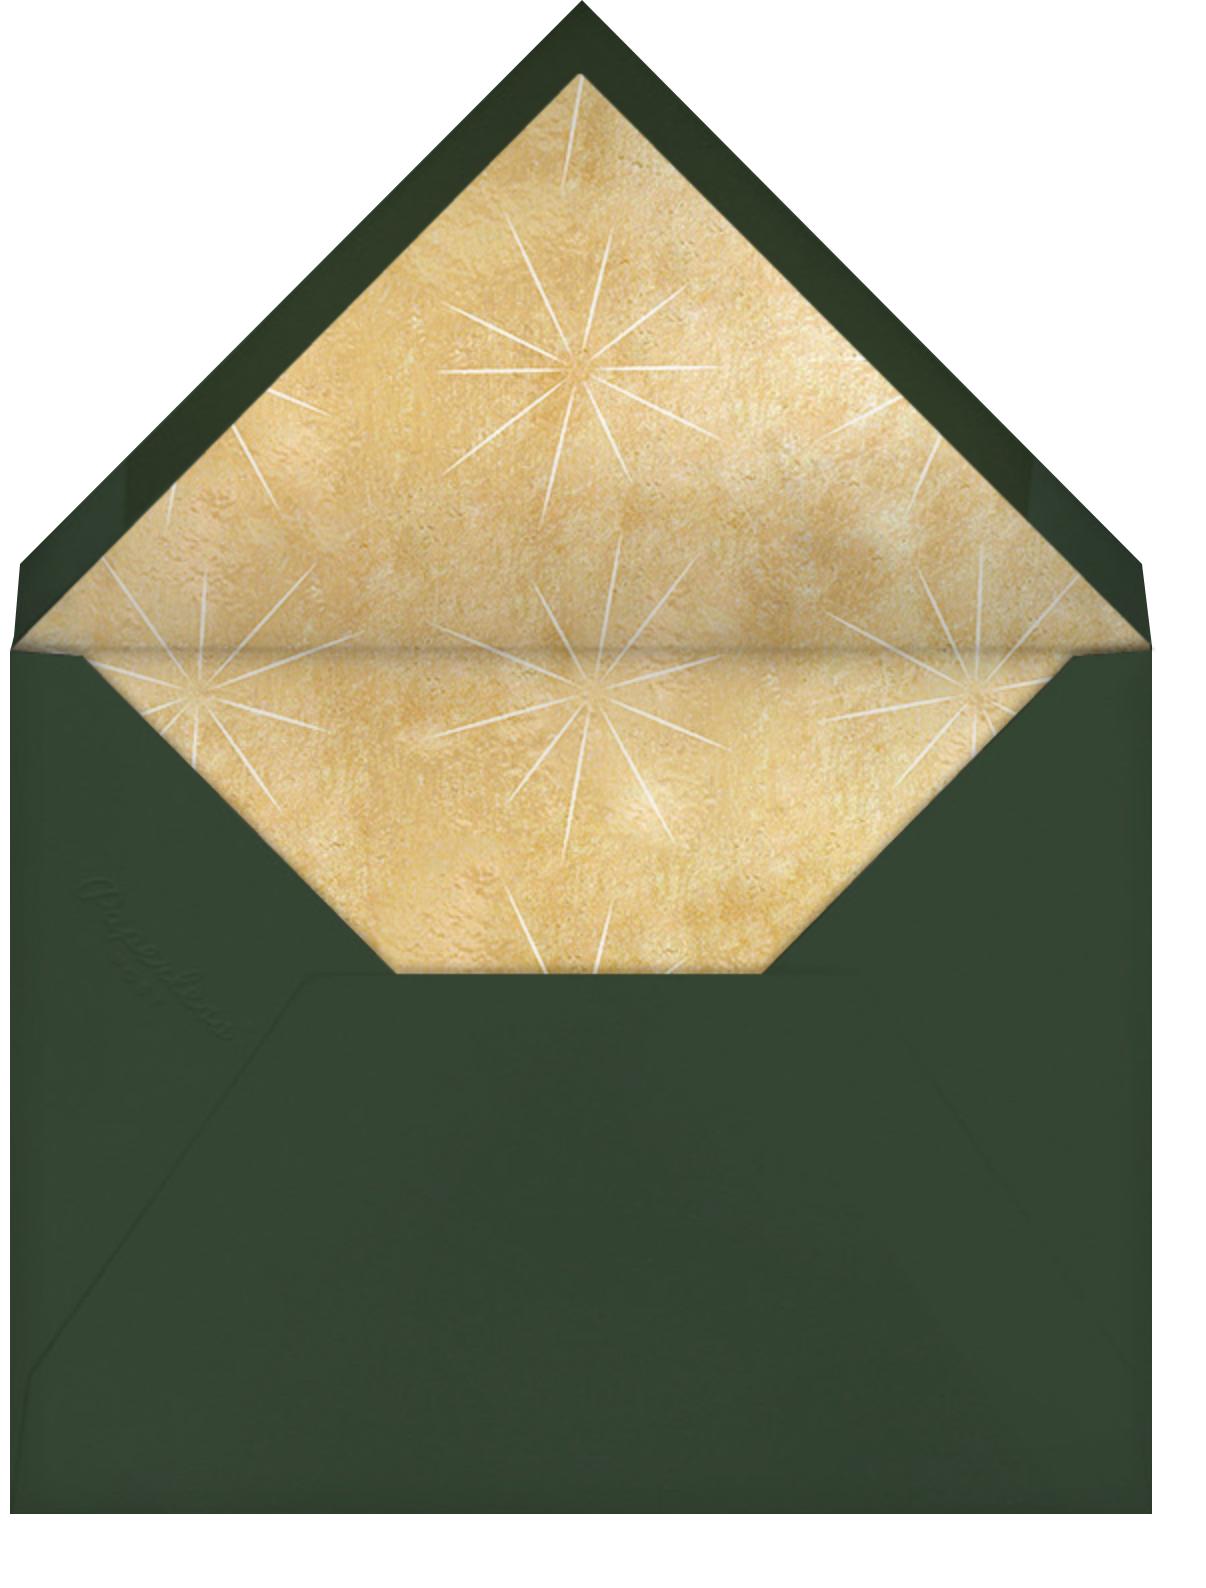 Pressed Oak - Green Gold - Paperless Post - Envelope